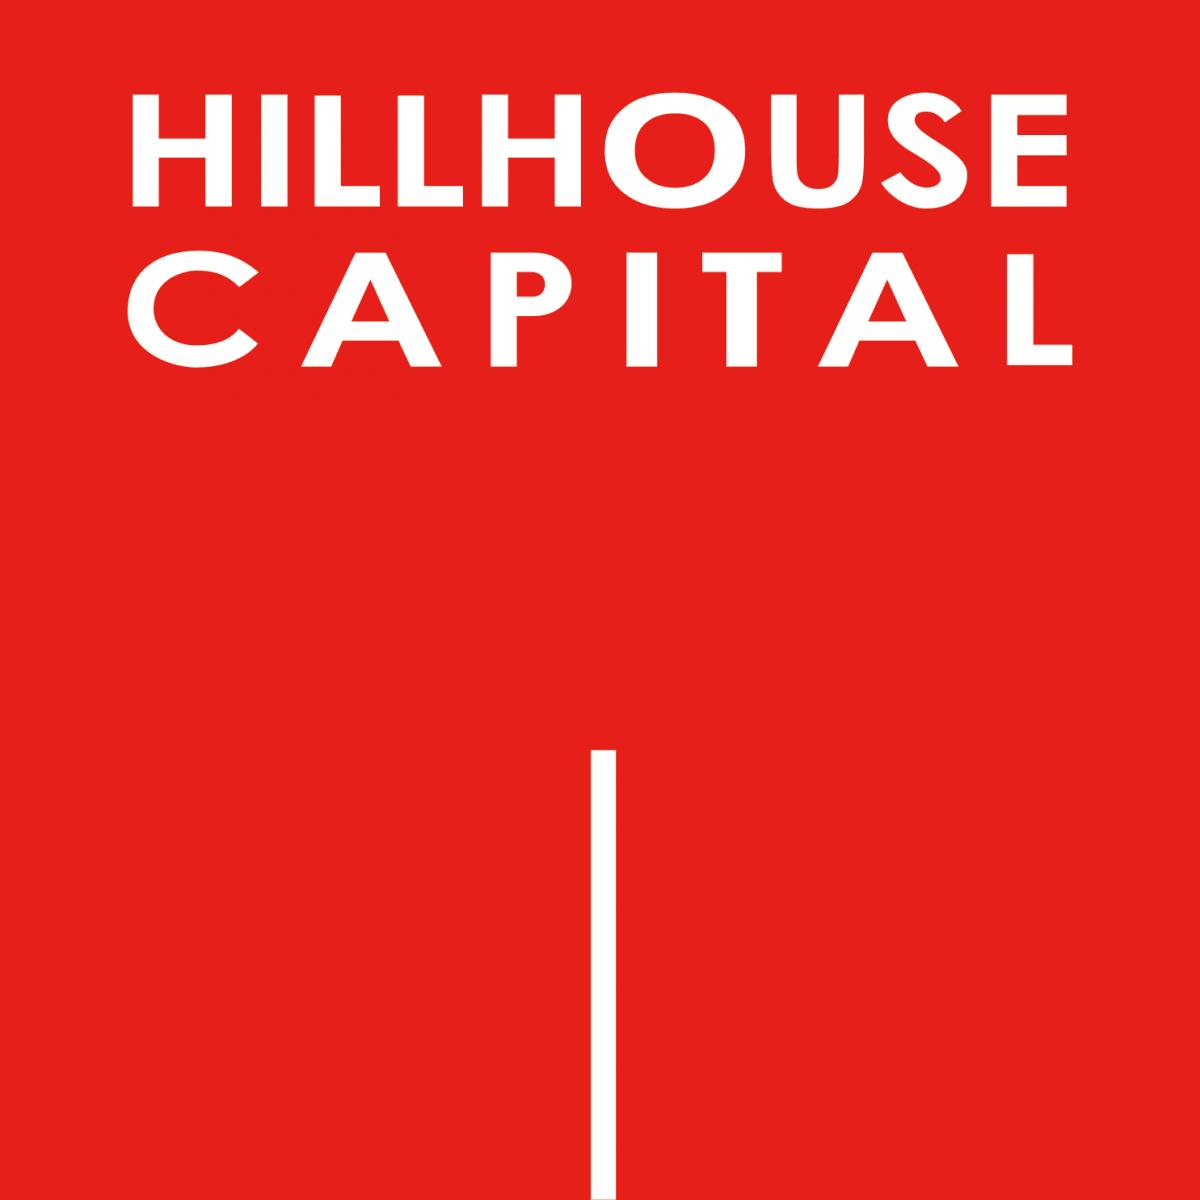 Hillhouse